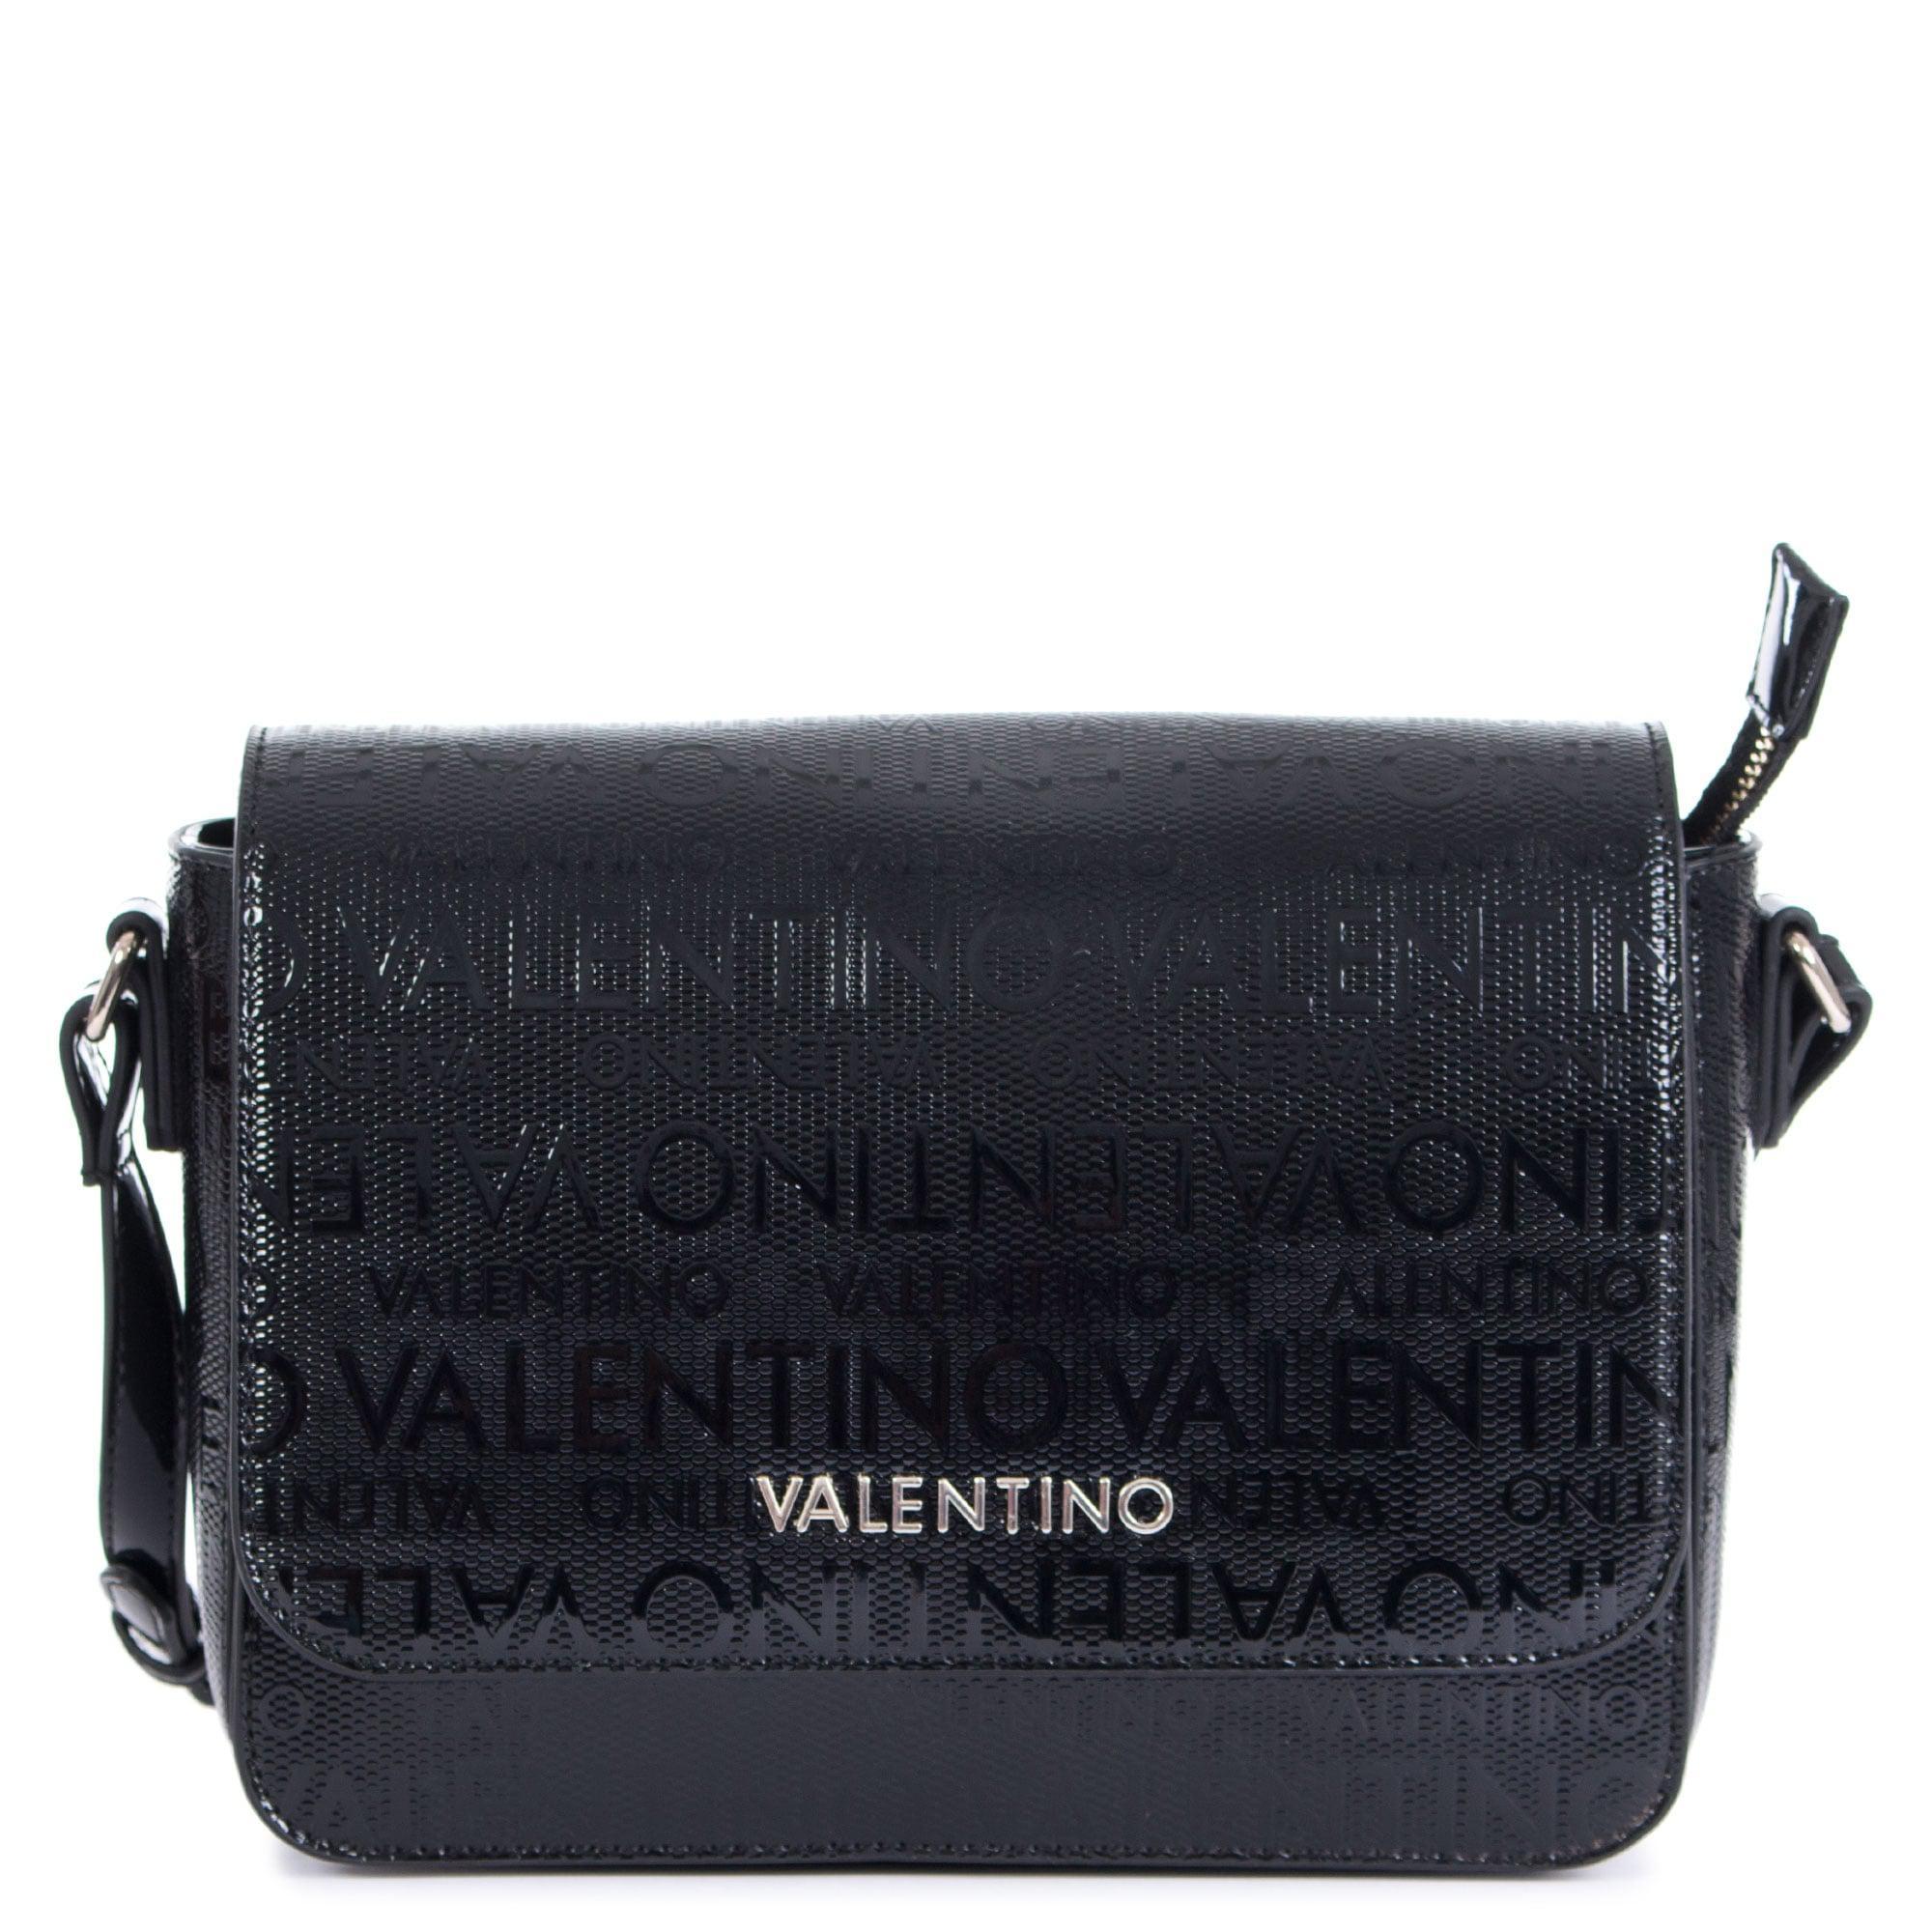 c02dc30621a5 Valentino By Mario Valentino Clove Logo Cross Body in Black - Lyst